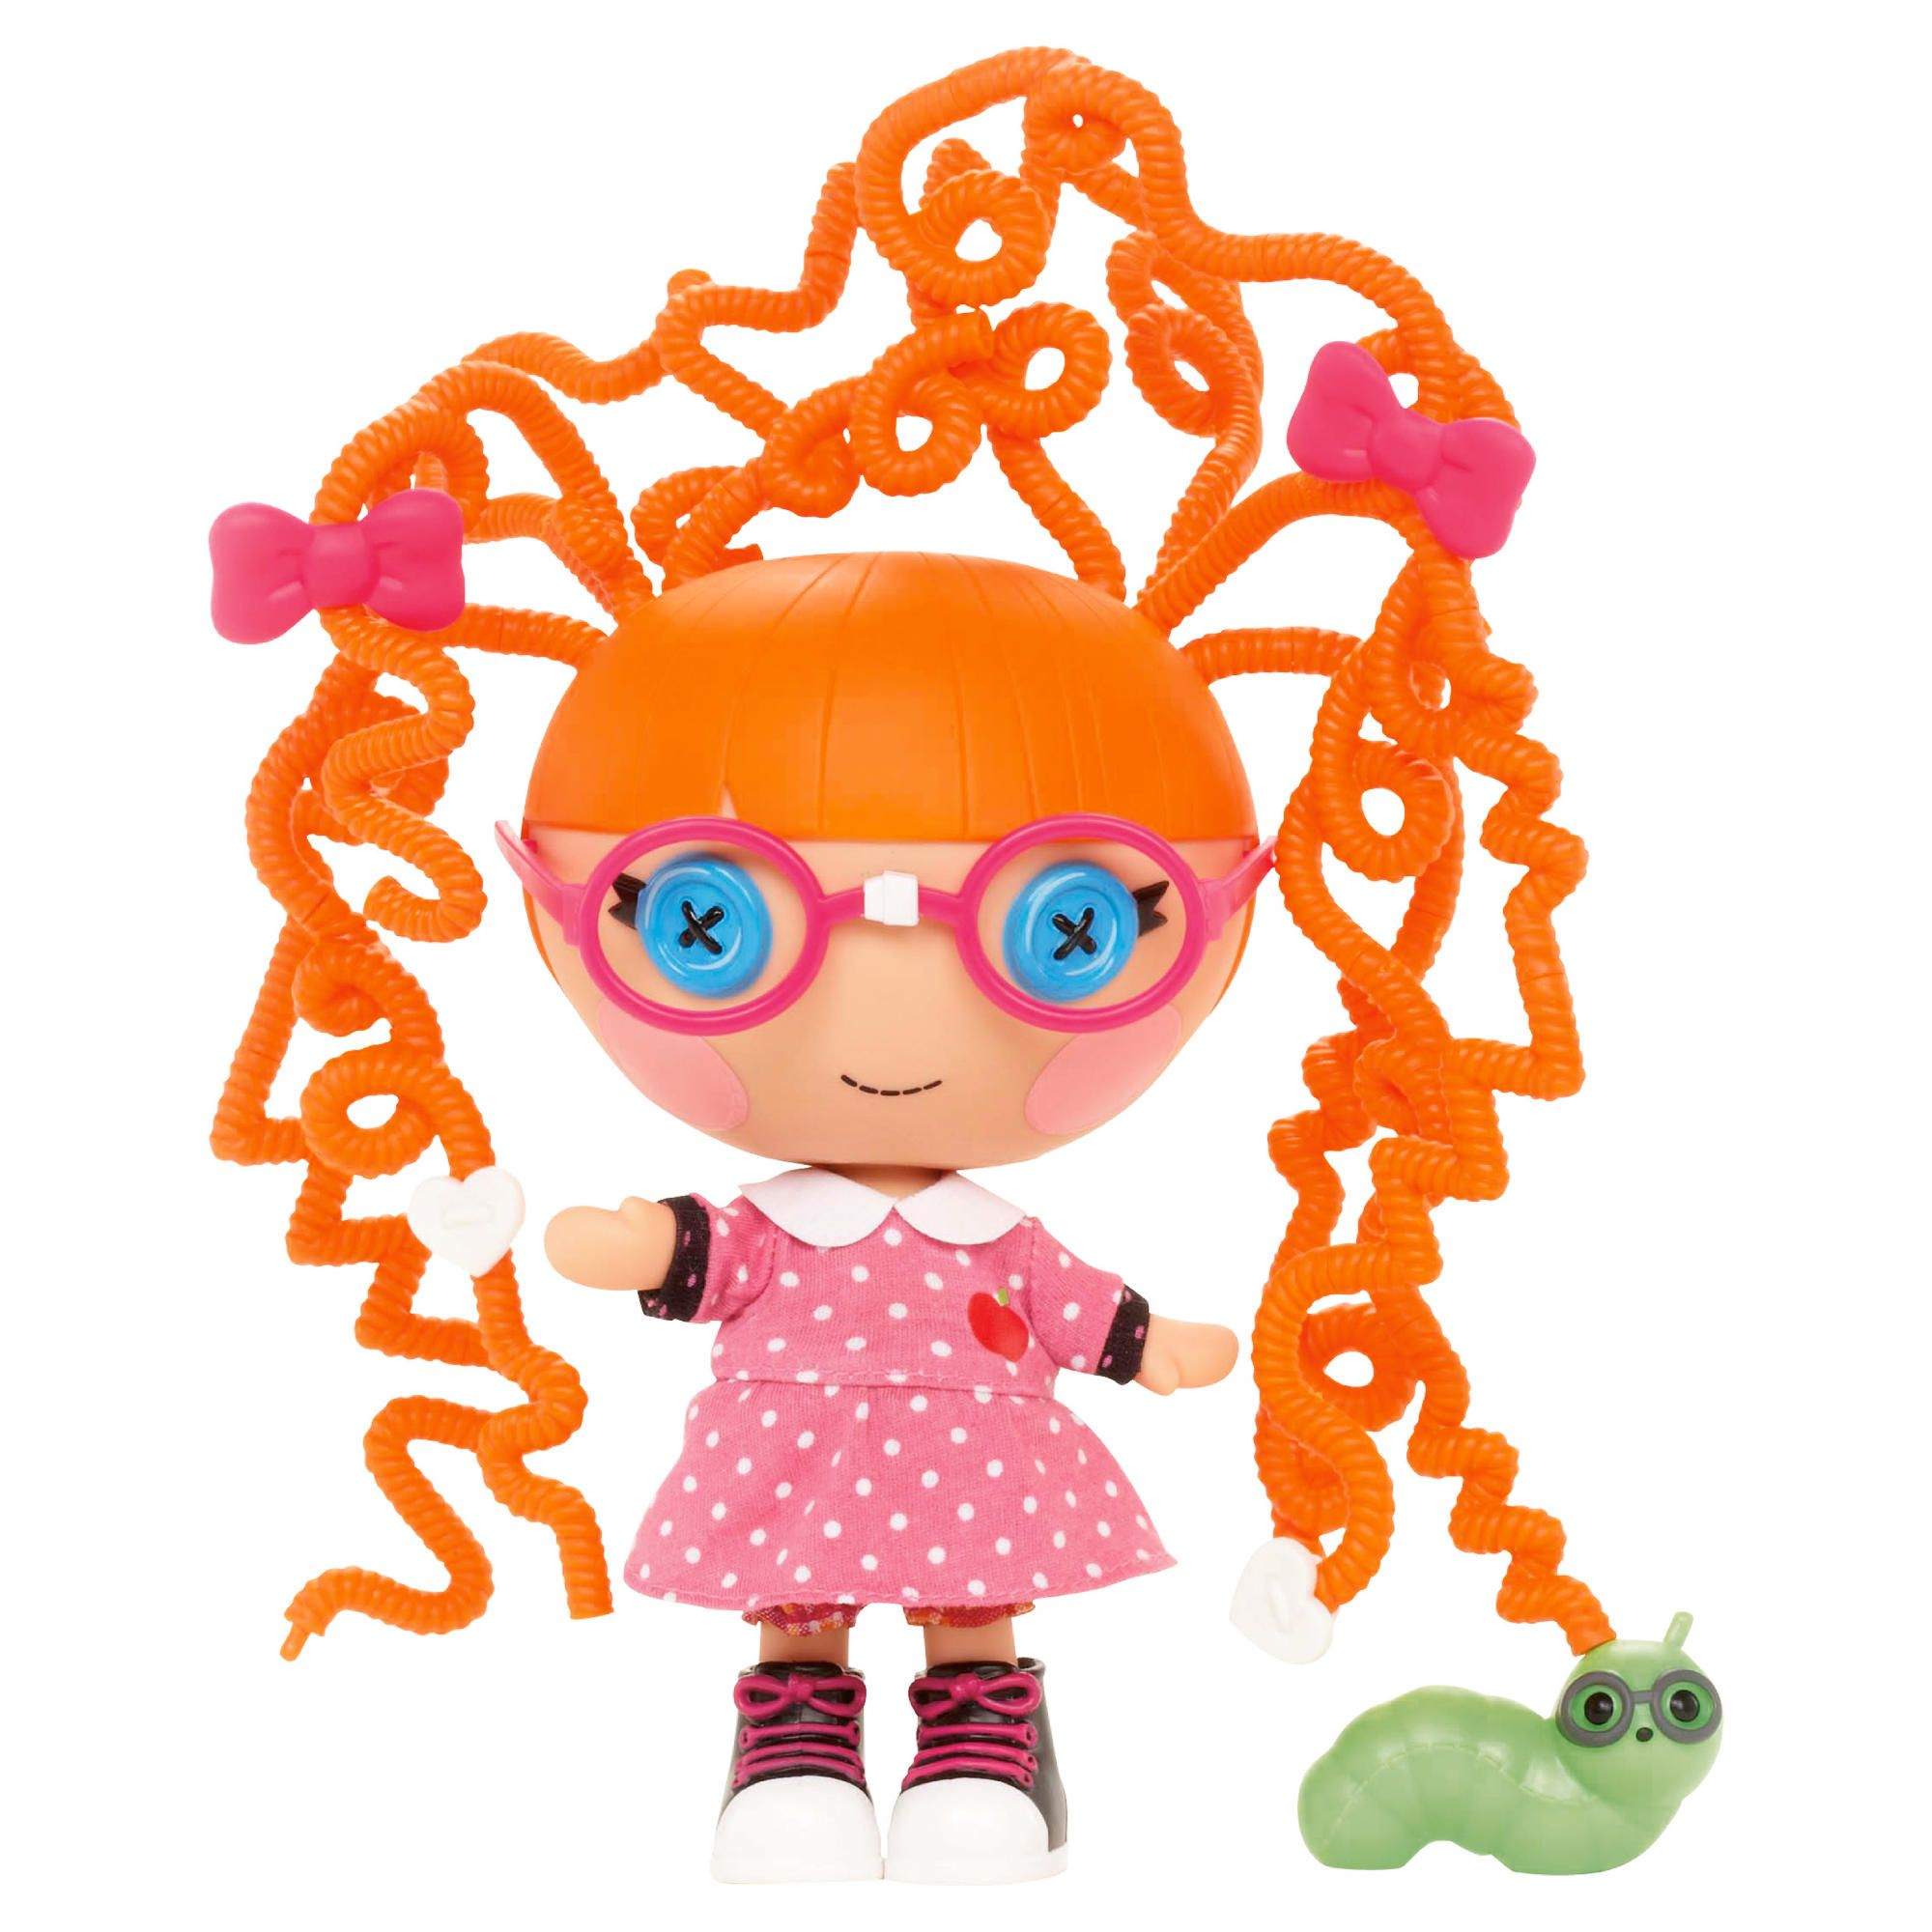 Doll clipart loopsy La Myshop Littles Hair Silly